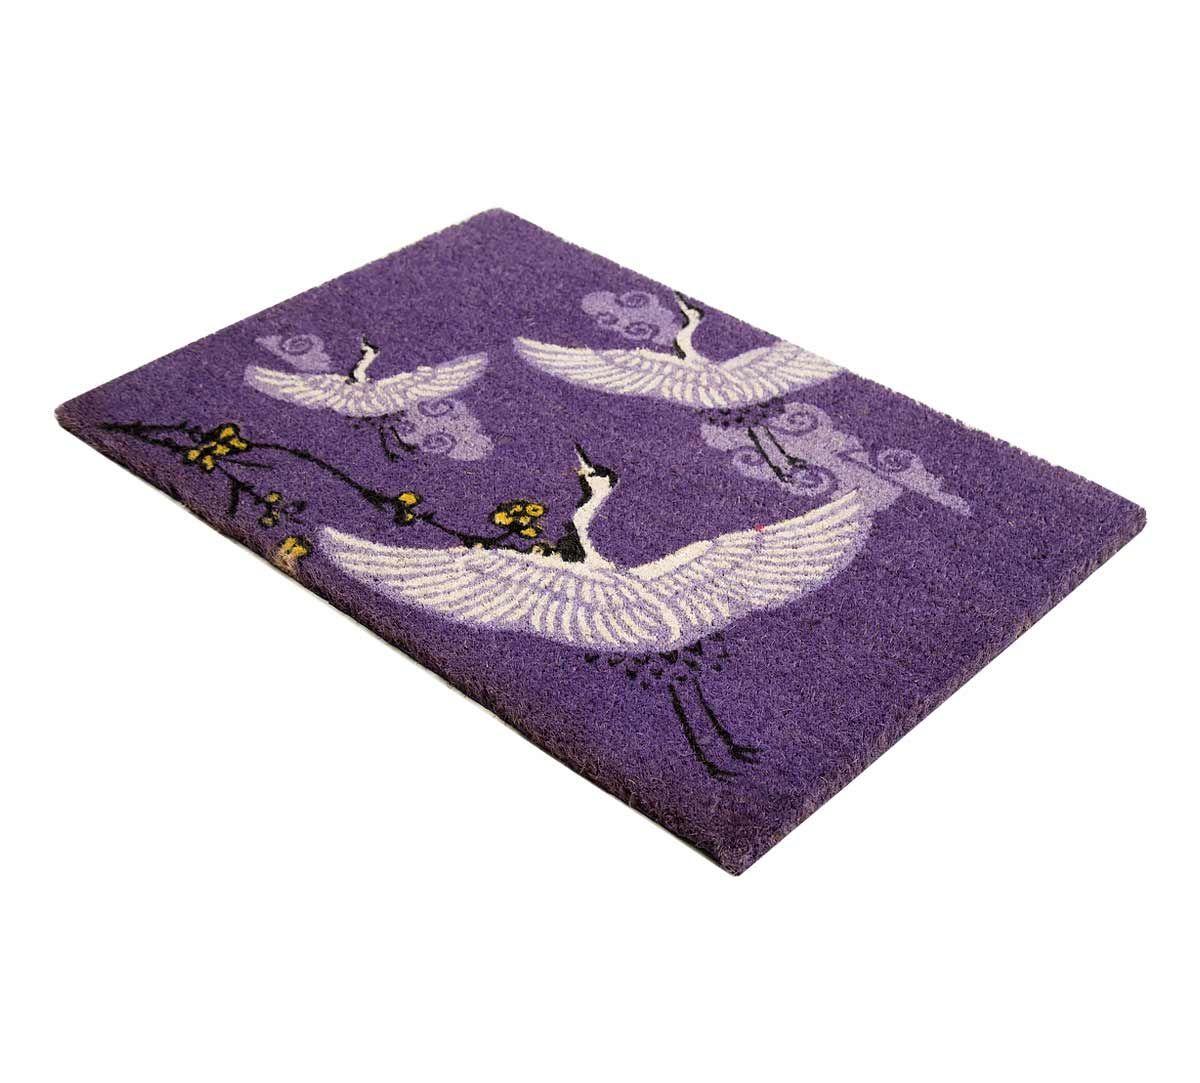 India Circus Legend of the Cranes Violet Doormat